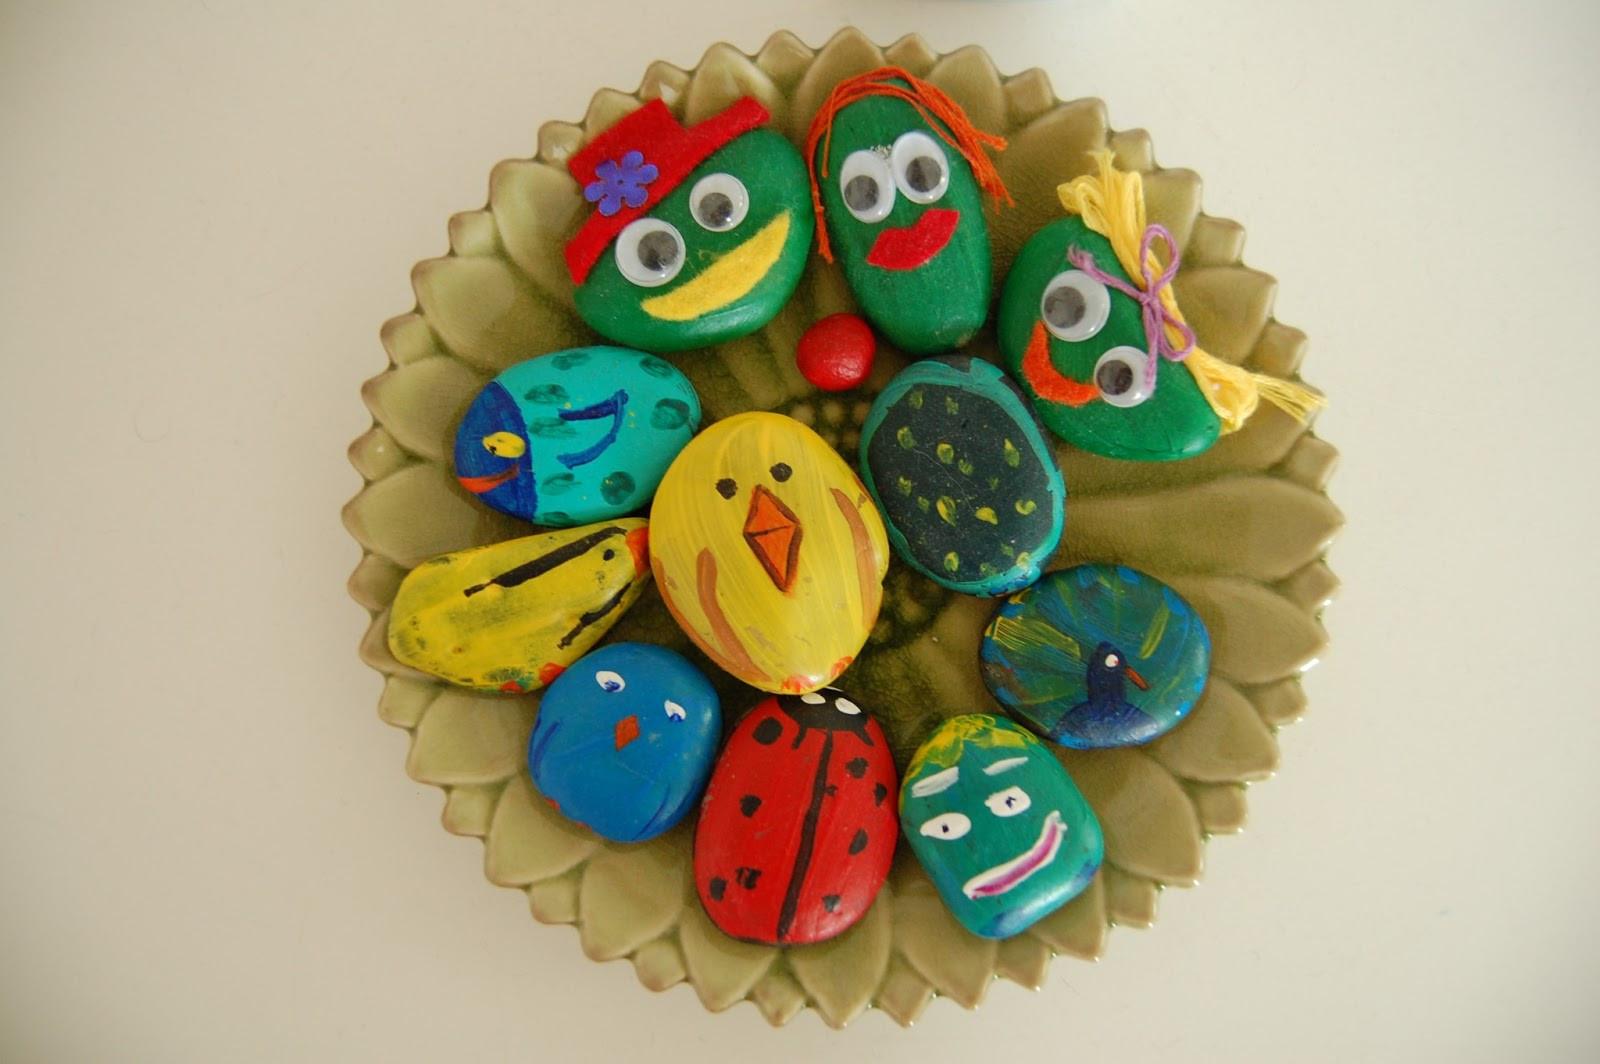 Best ideas about Kids Craft Ideas . Save or Pin Super Fun Kids Crafts Unique Kids Crafts Now.